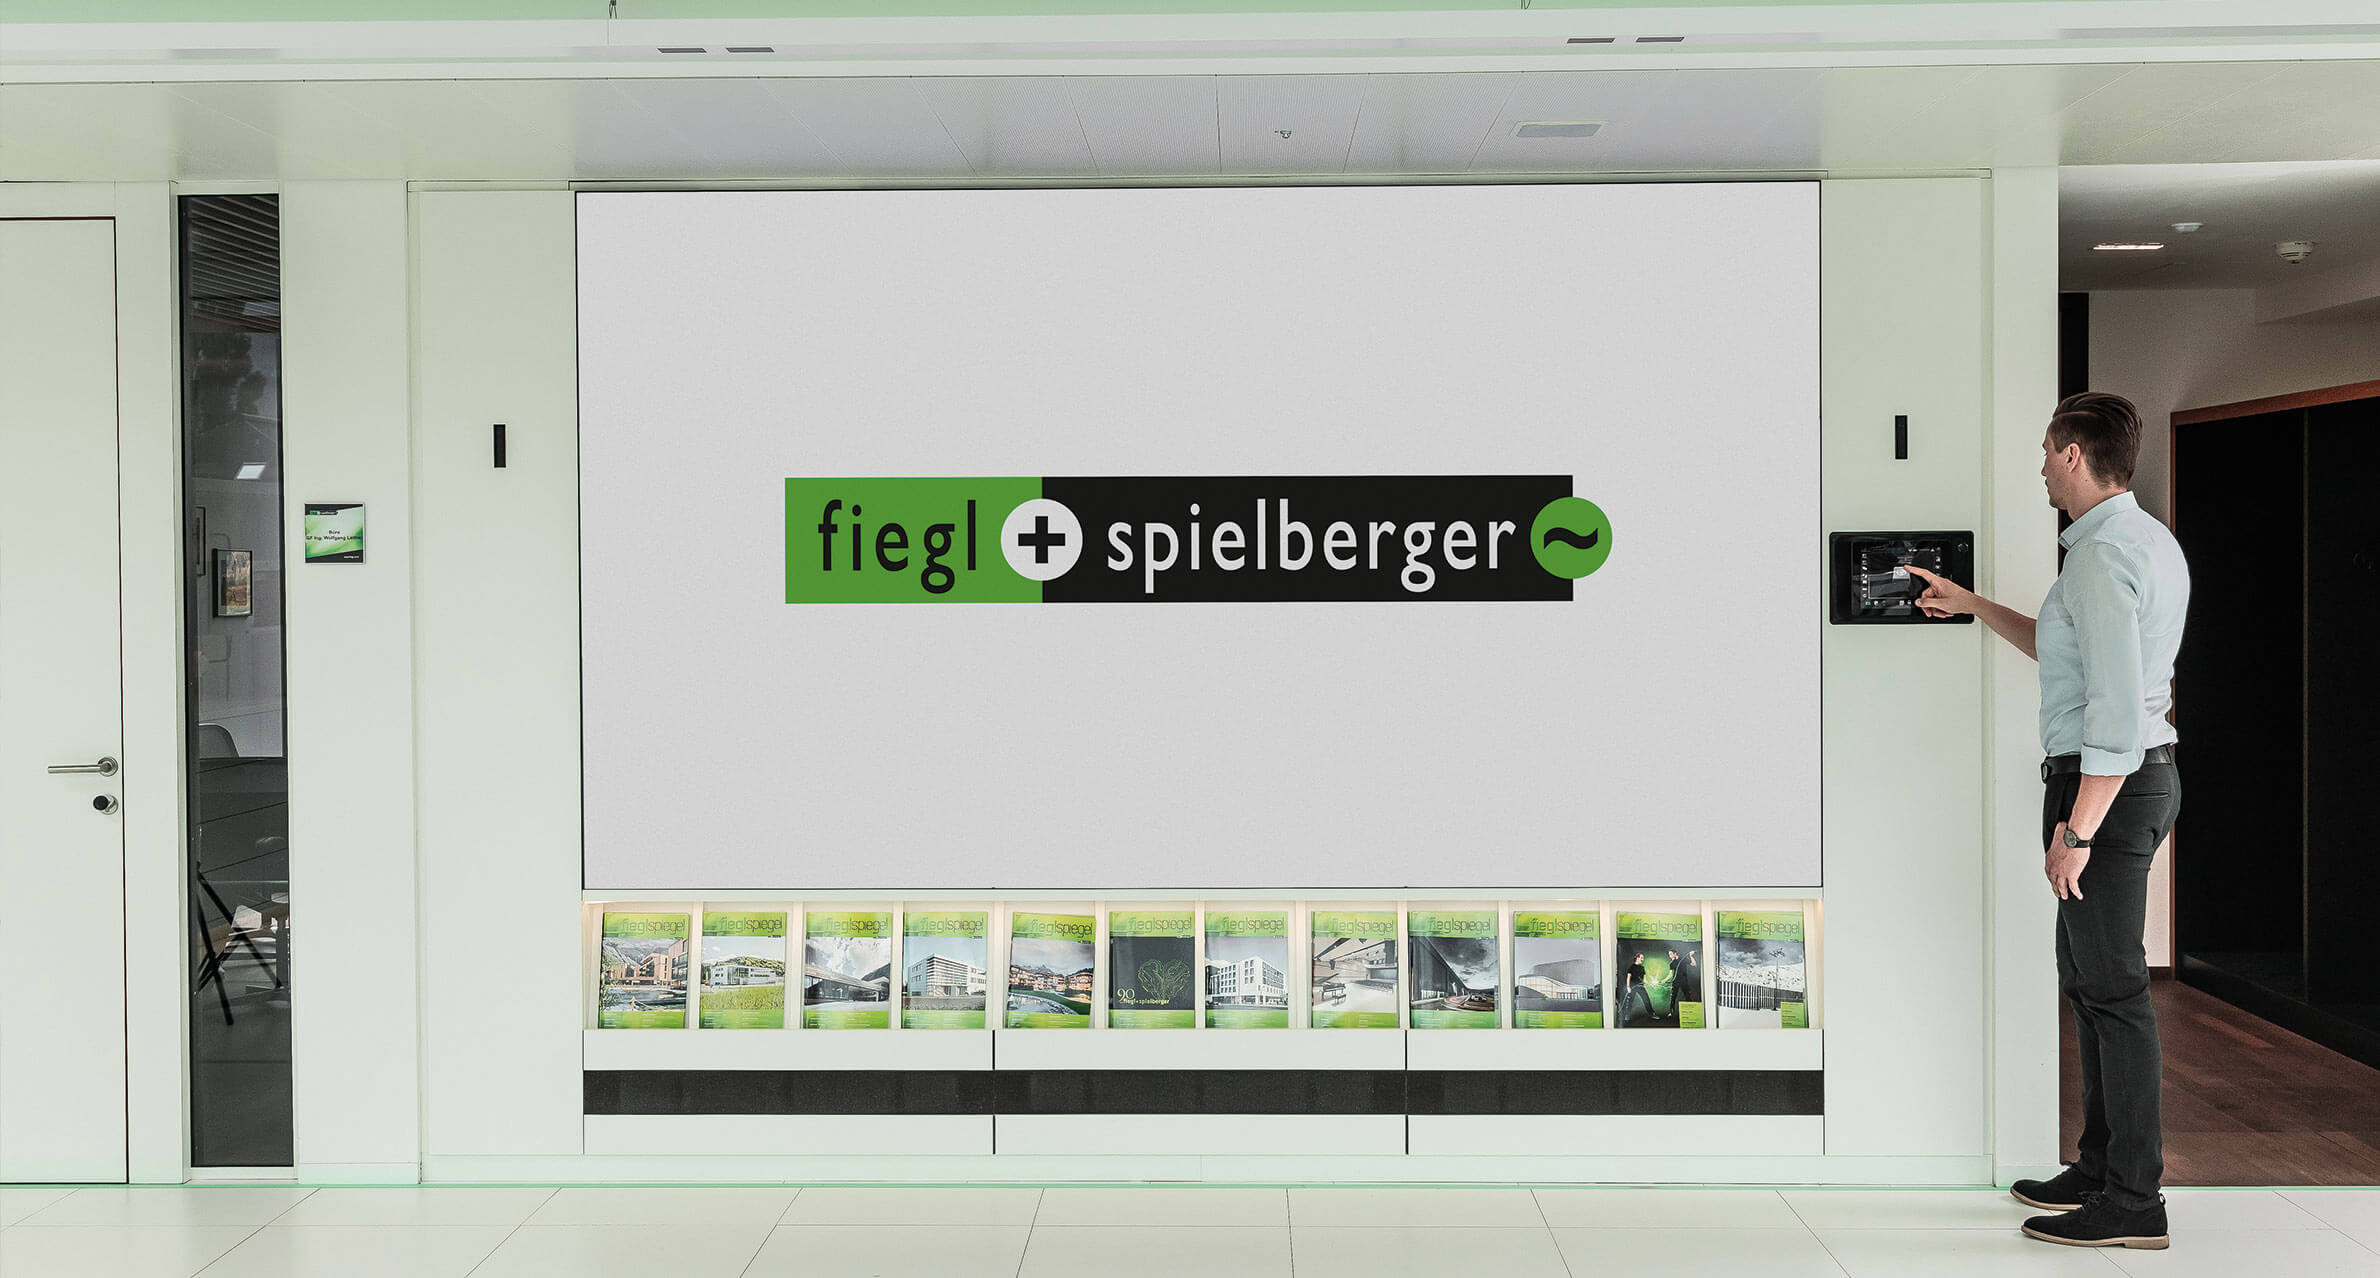 Fiegl+Spielberger Video Wall